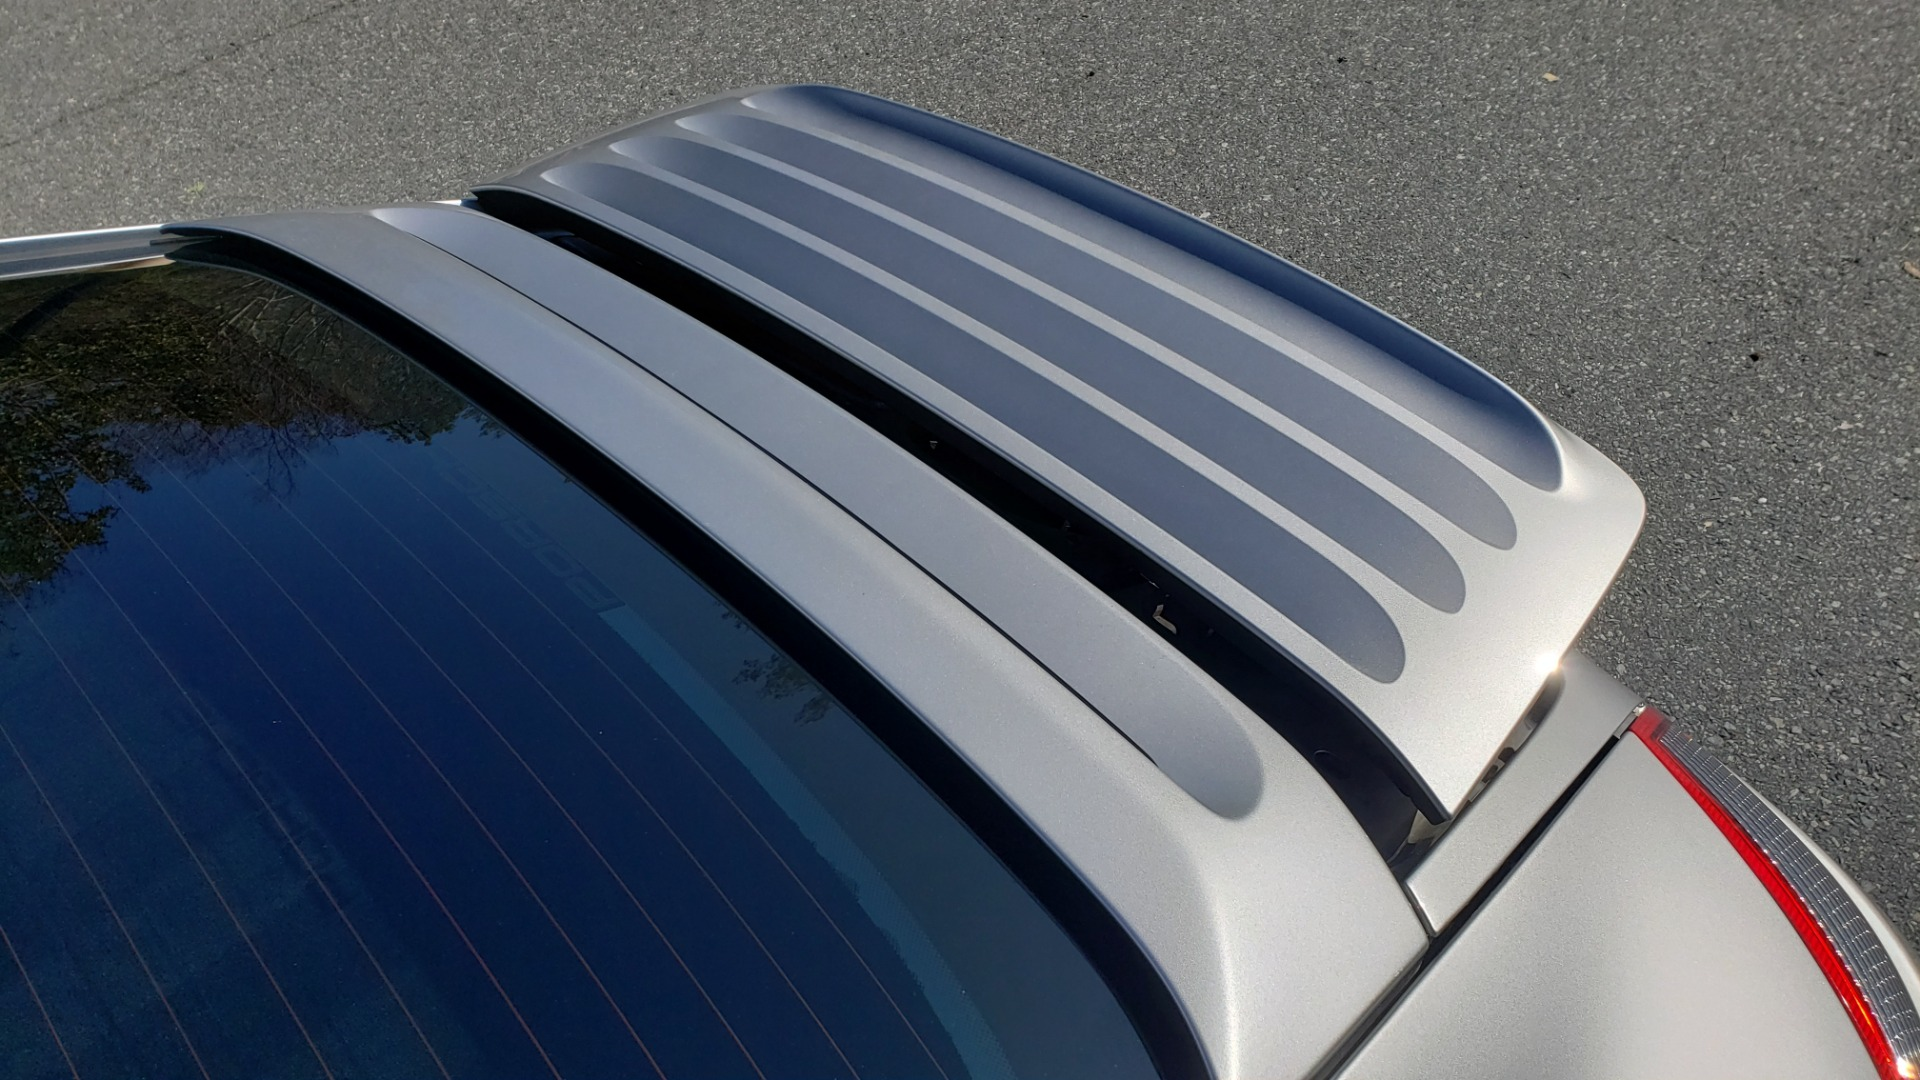 Used 2006 Porsche 911 CARRERA S / 5-SPD AUTO / SPORT CHRONO / NAV / BOSE / SUNROOF for sale Sold at Formula Imports in Charlotte NC 28227 25